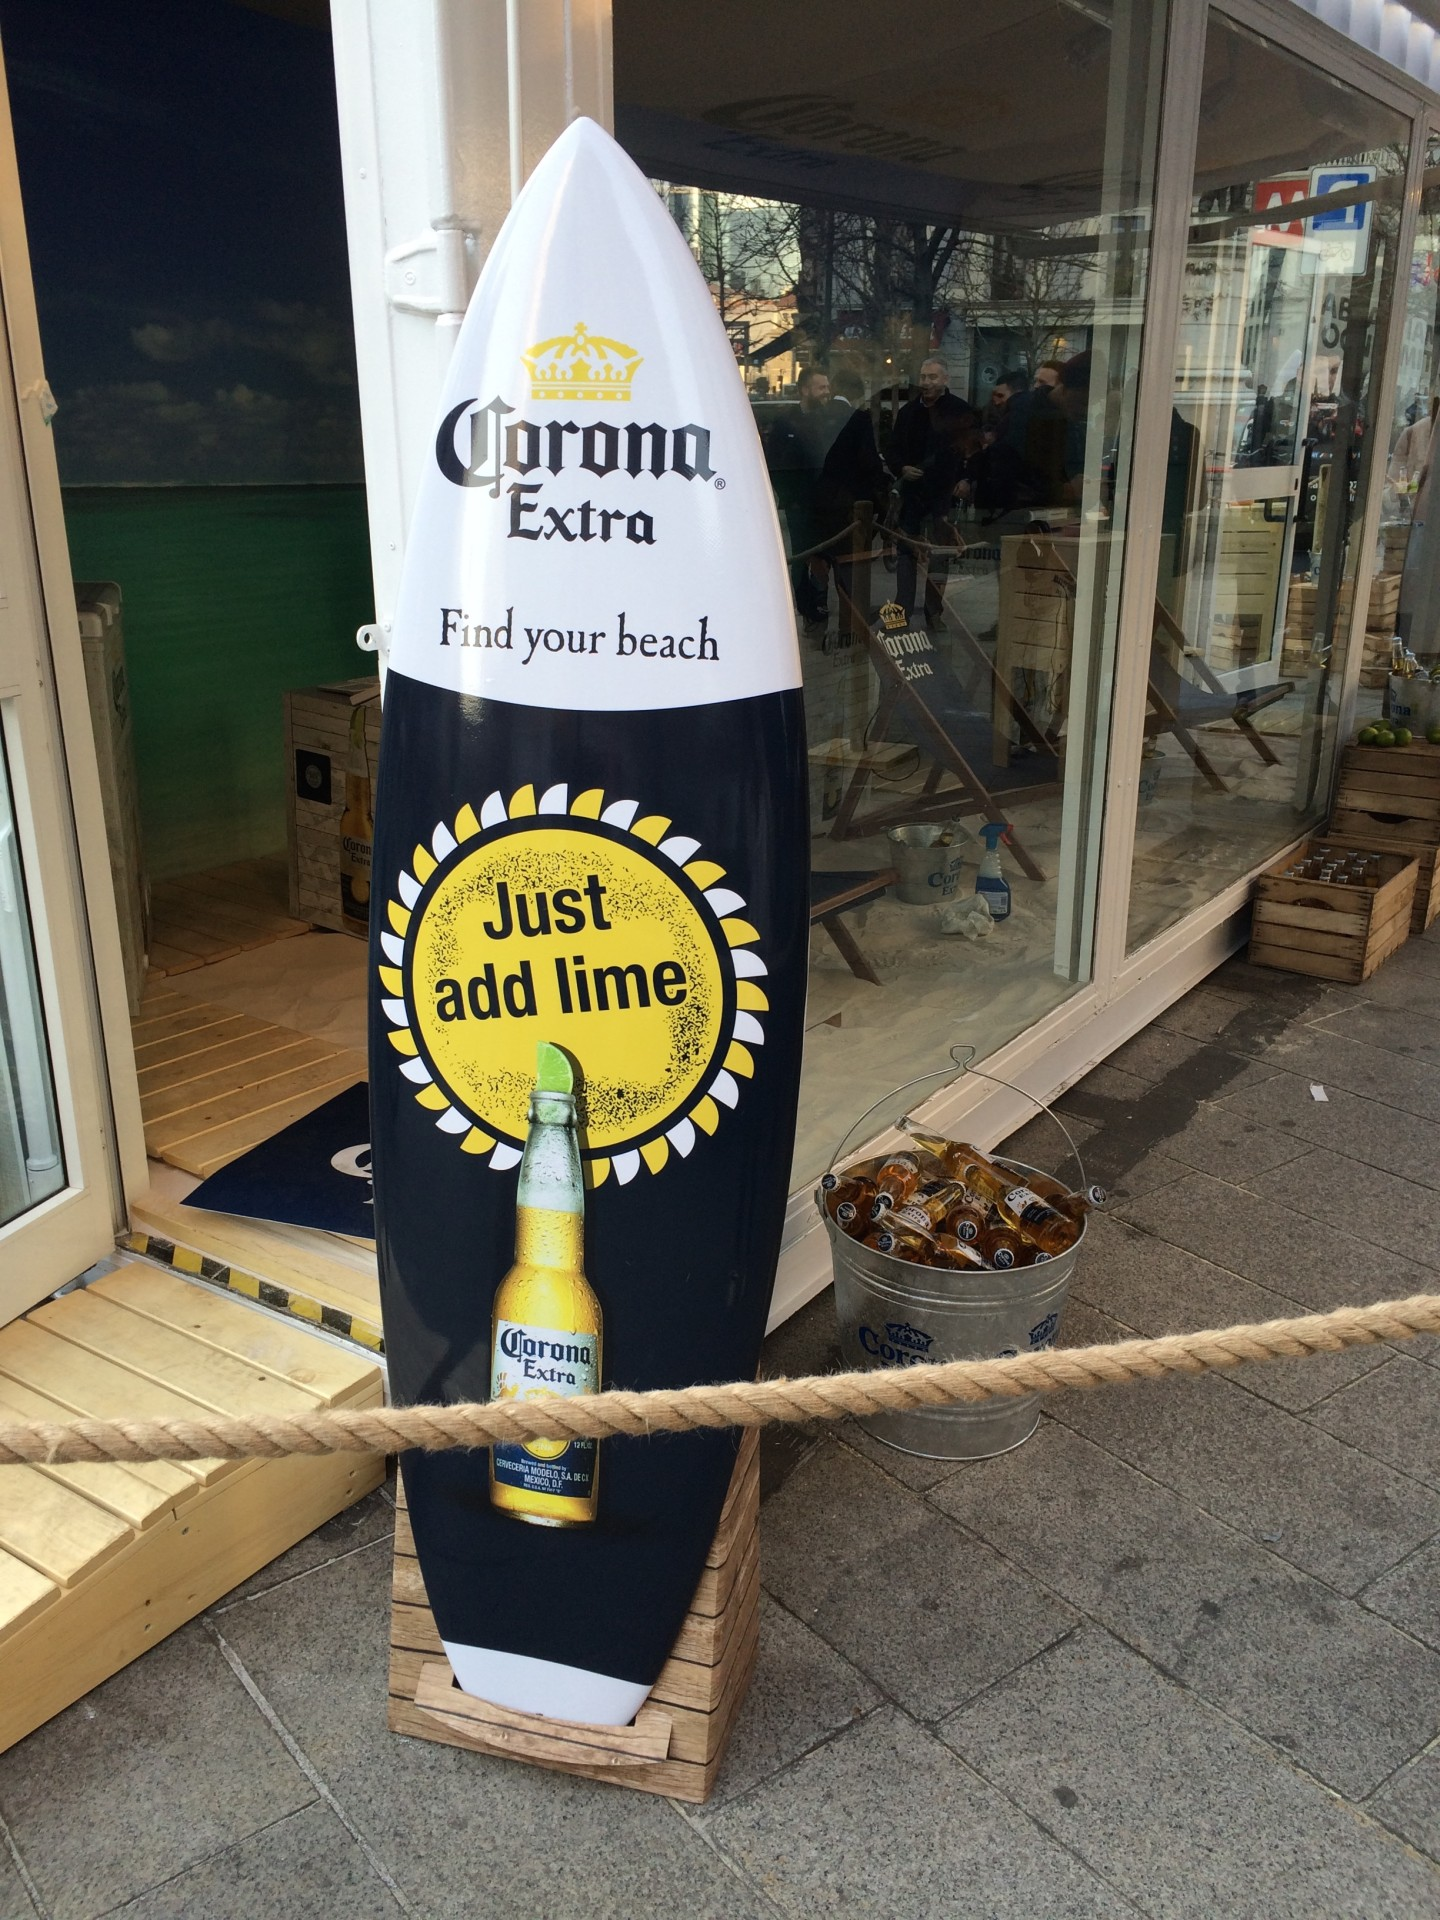 Corona-Extra-Find-your-Beach-valentina-coco-fashion-blogger